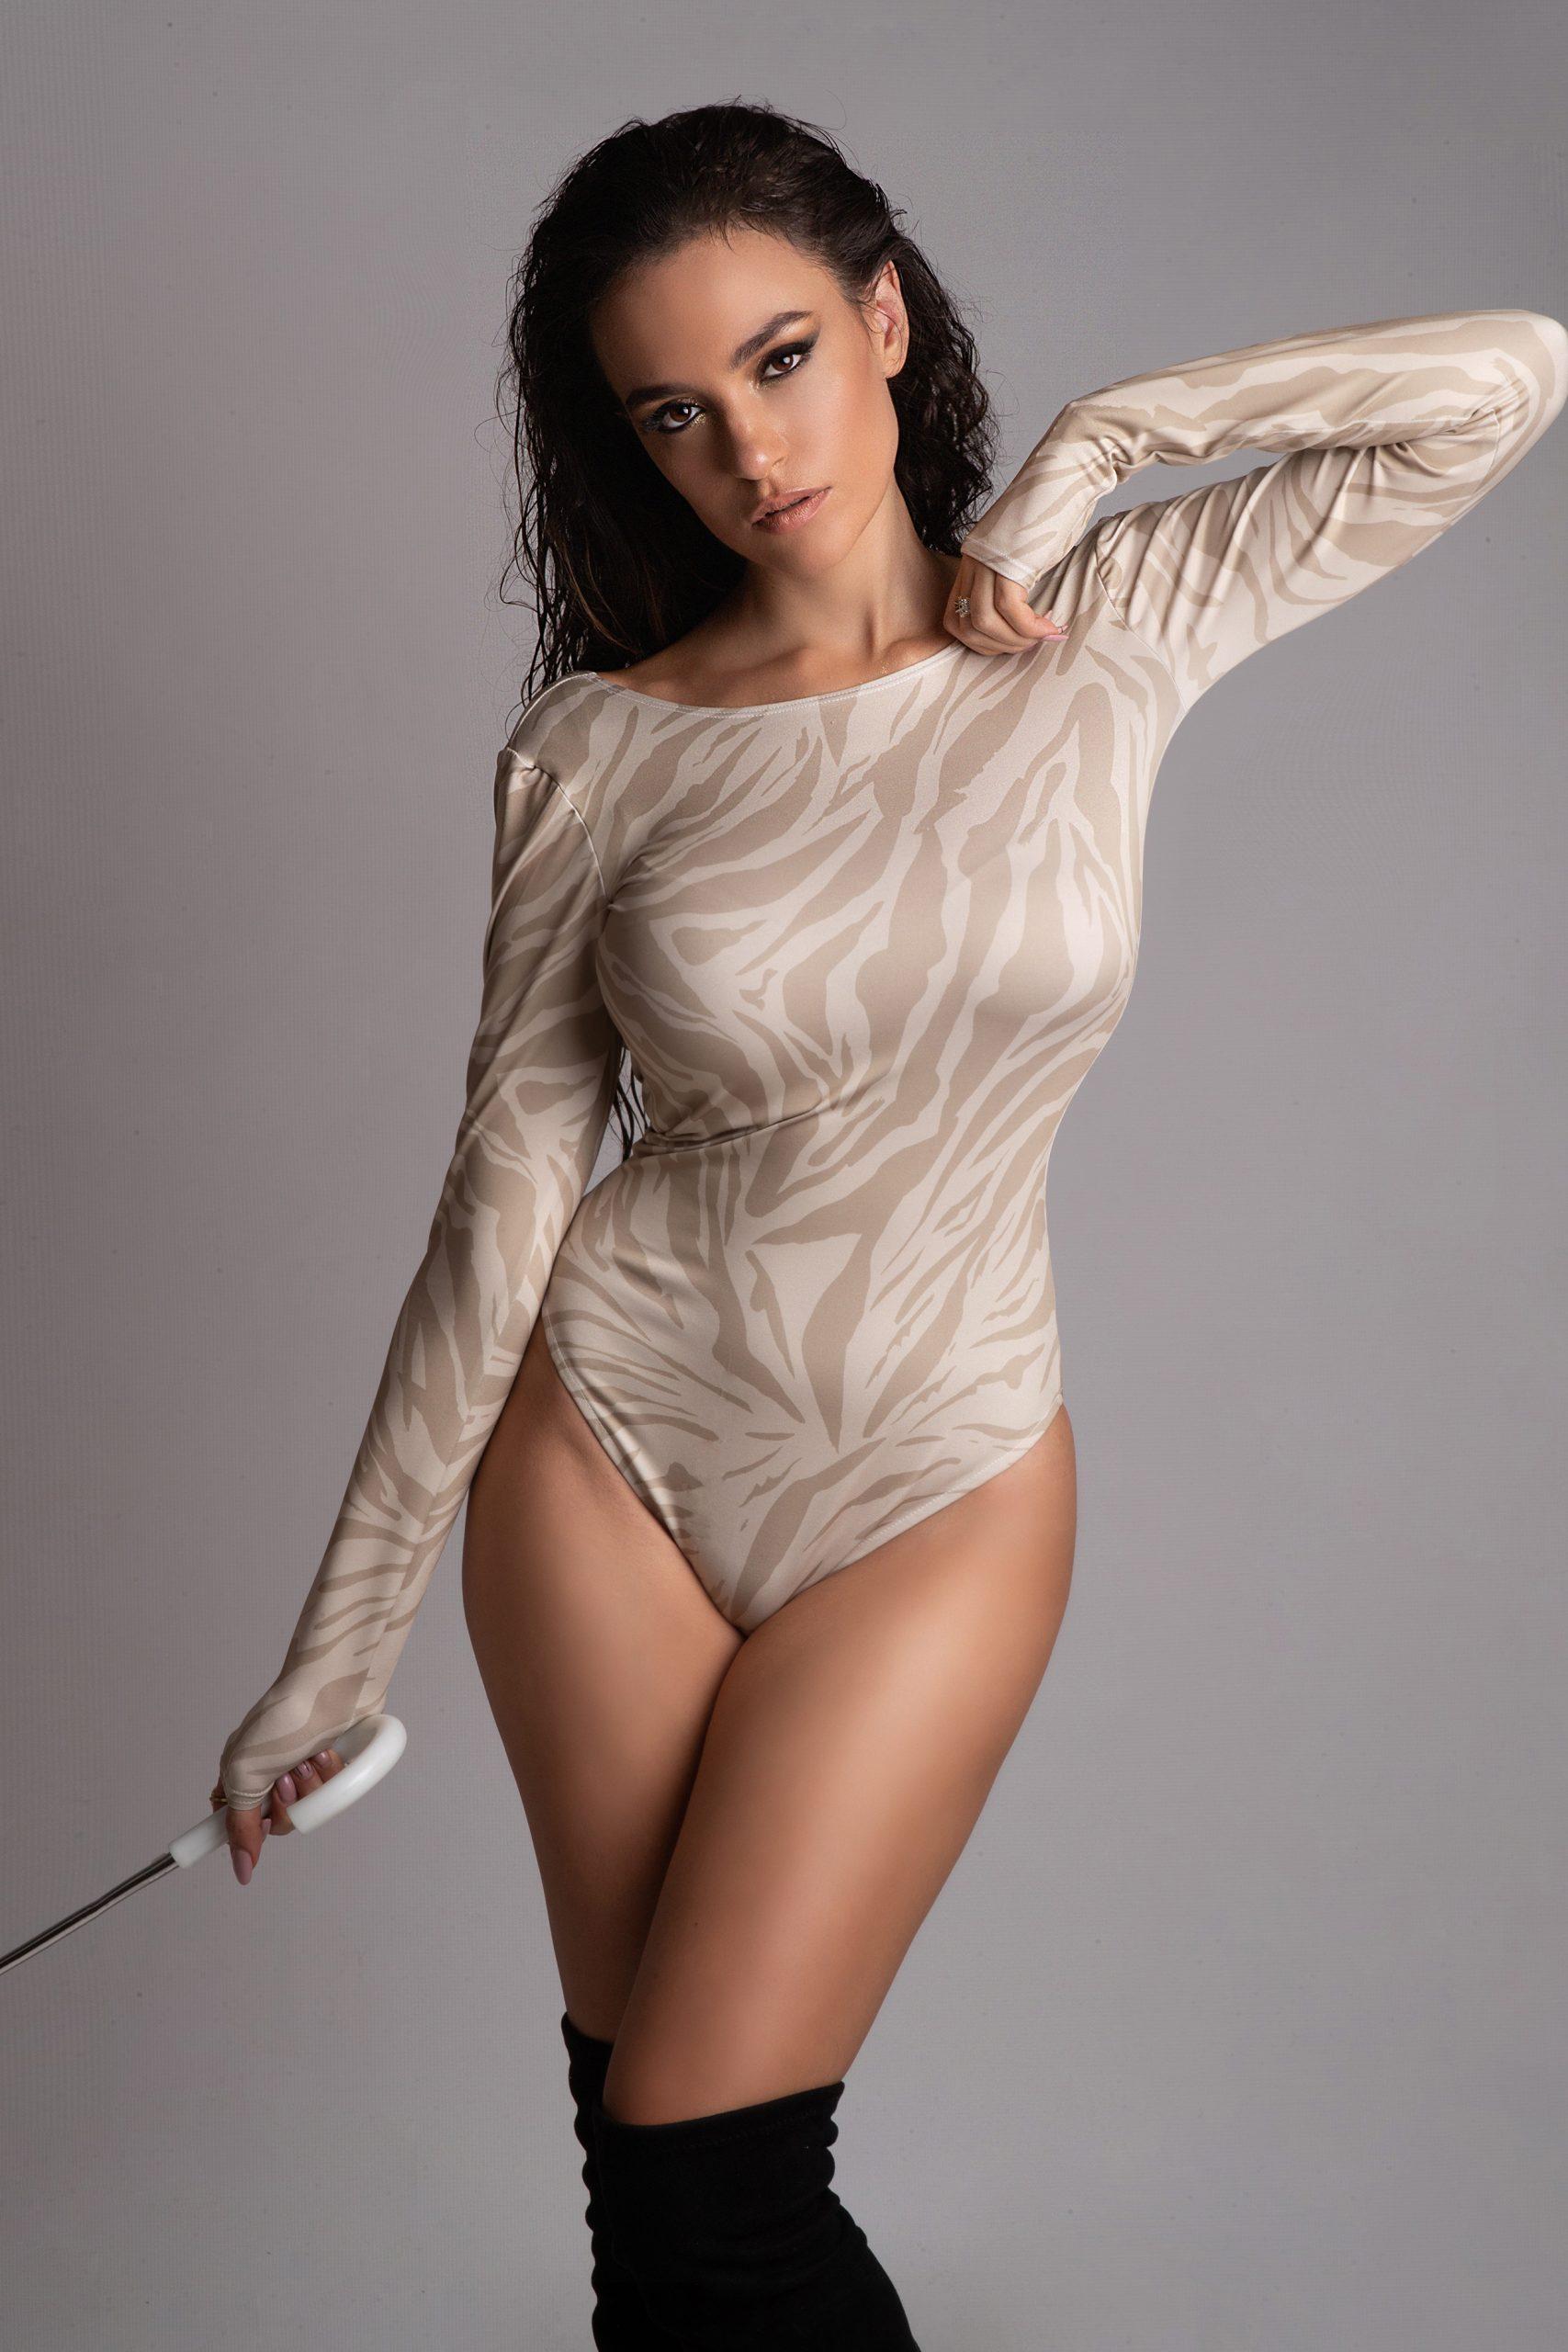 Eva Murati wearing a bodysuit animal pattern